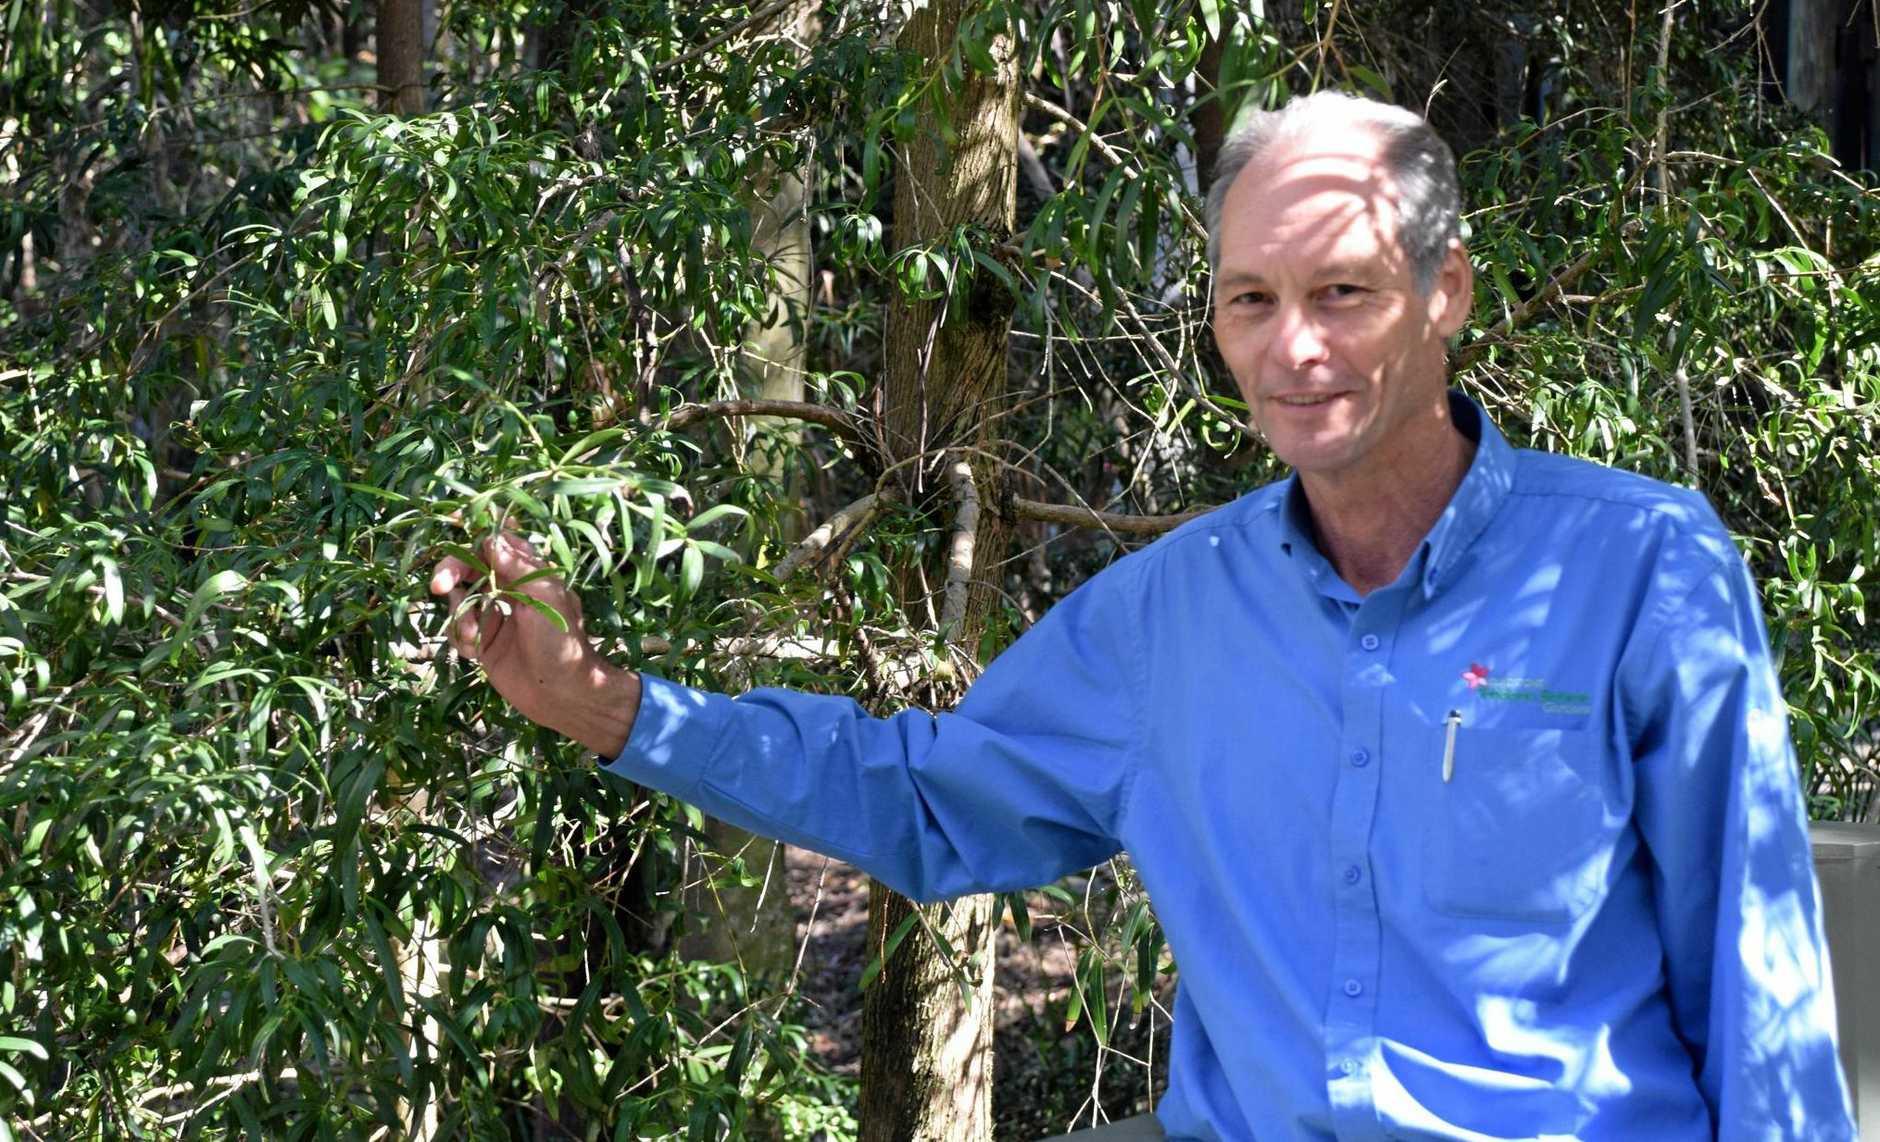 SEASONAL BOTANY: Brent Braddick, Tondoon Gardens Curator